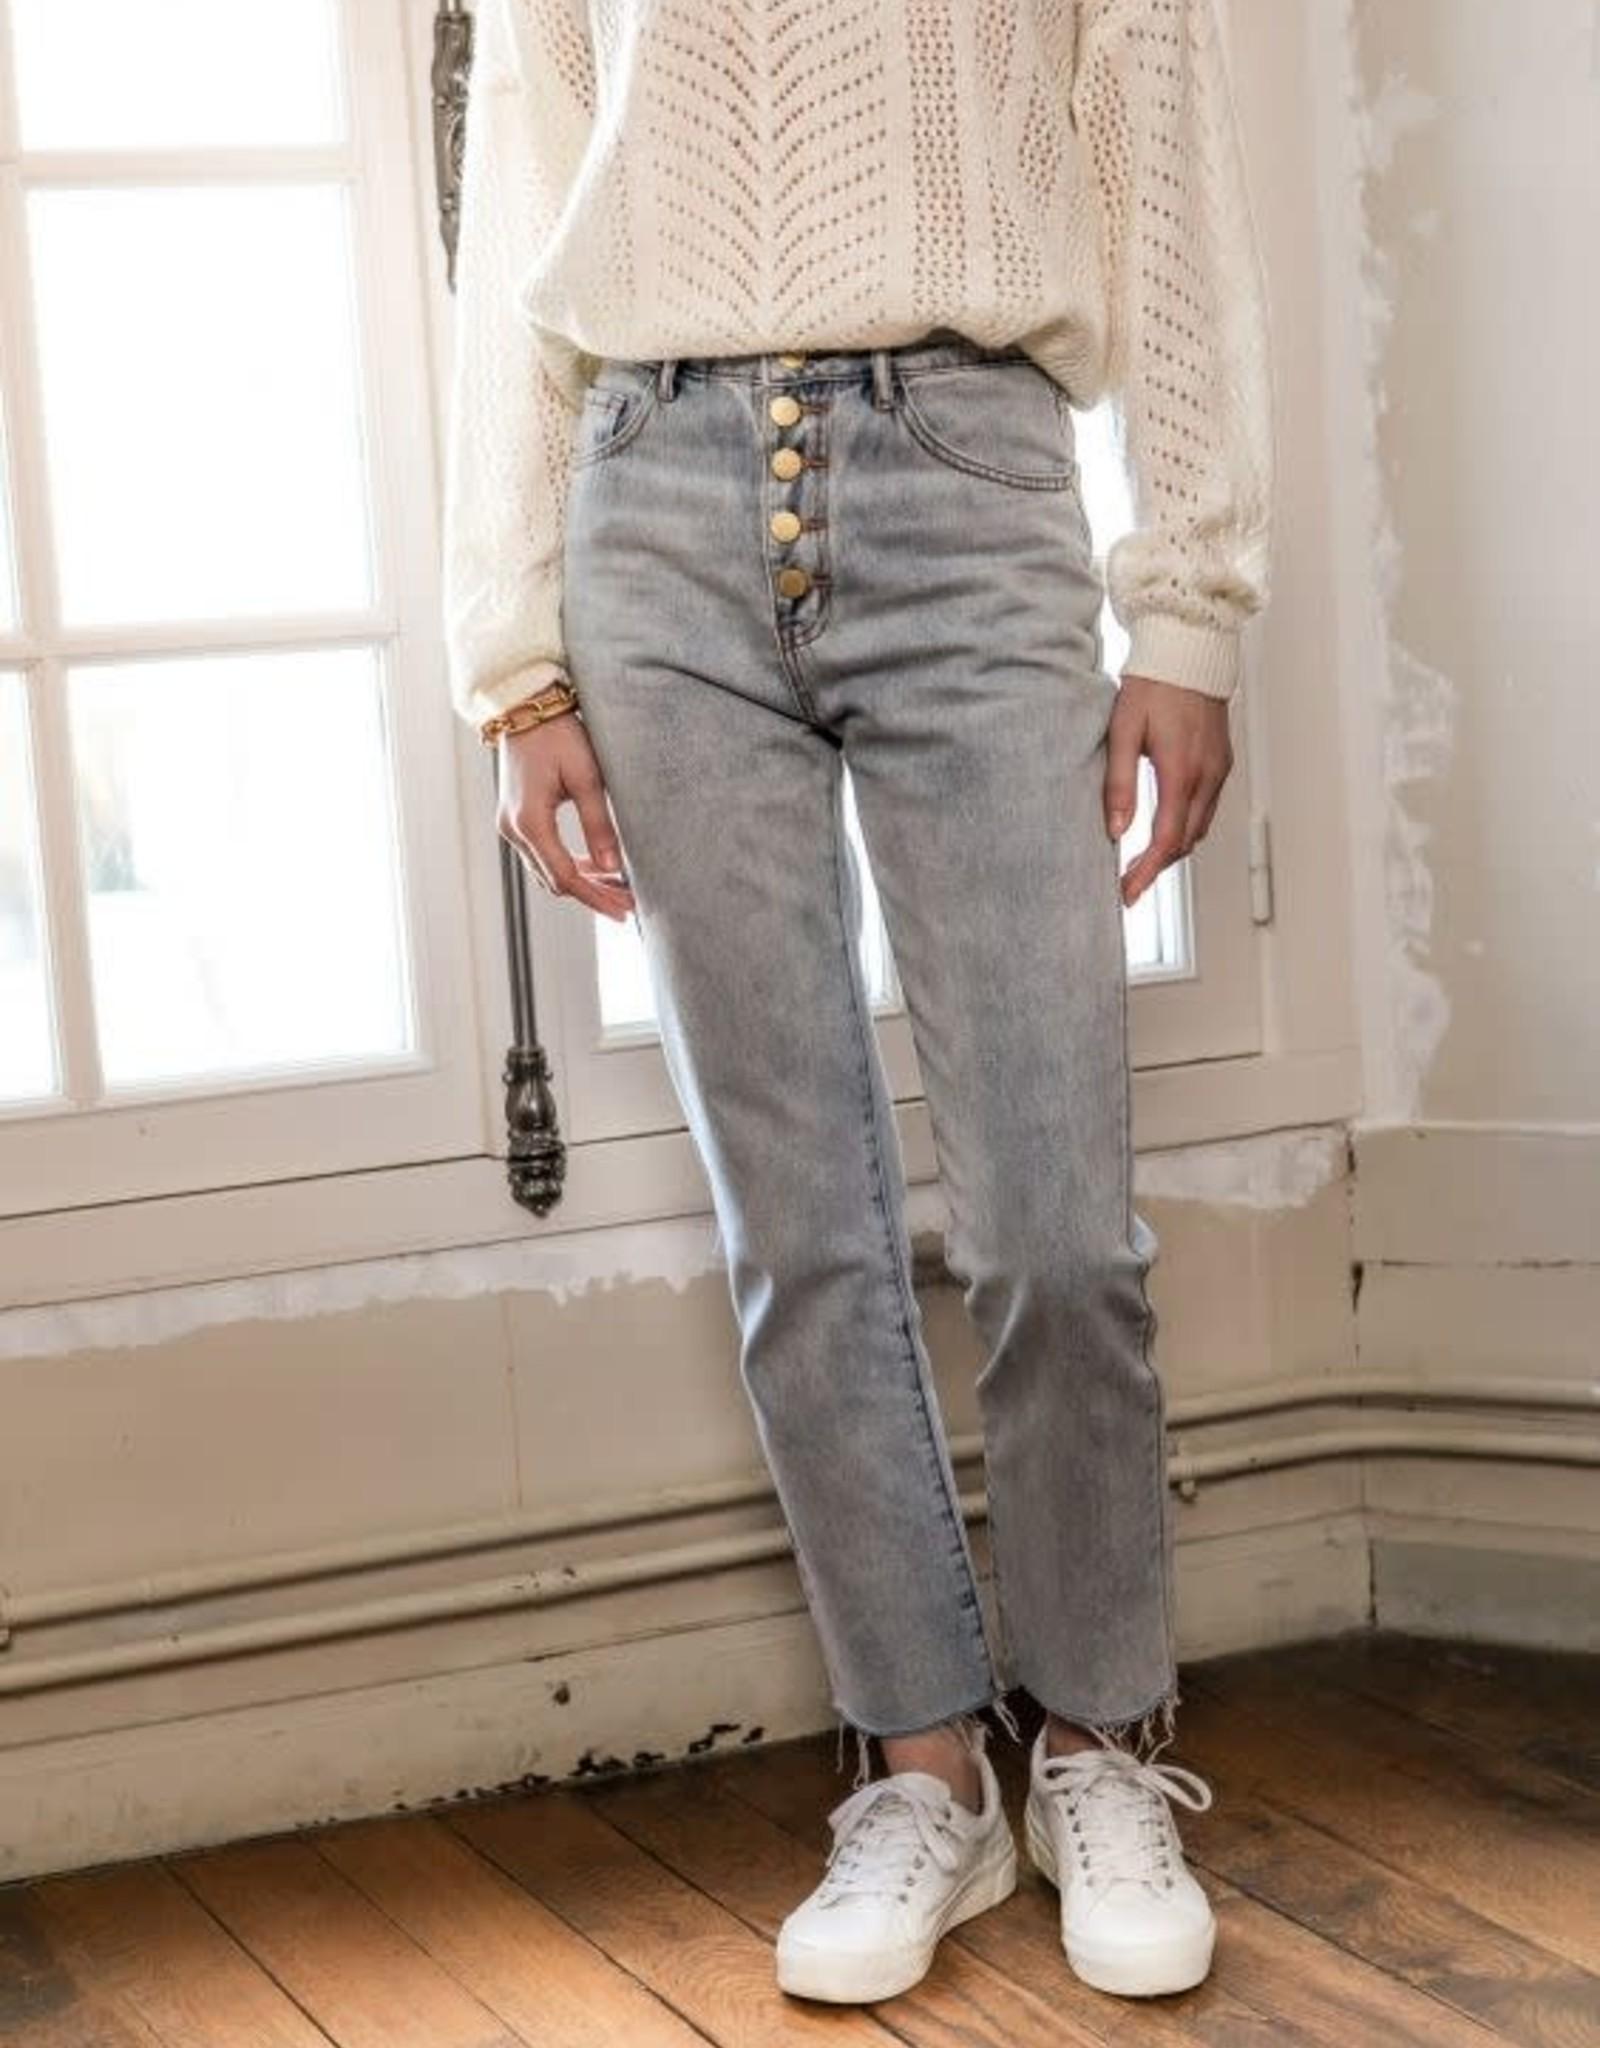 La Petite Etoile Jeans 'Chufy'